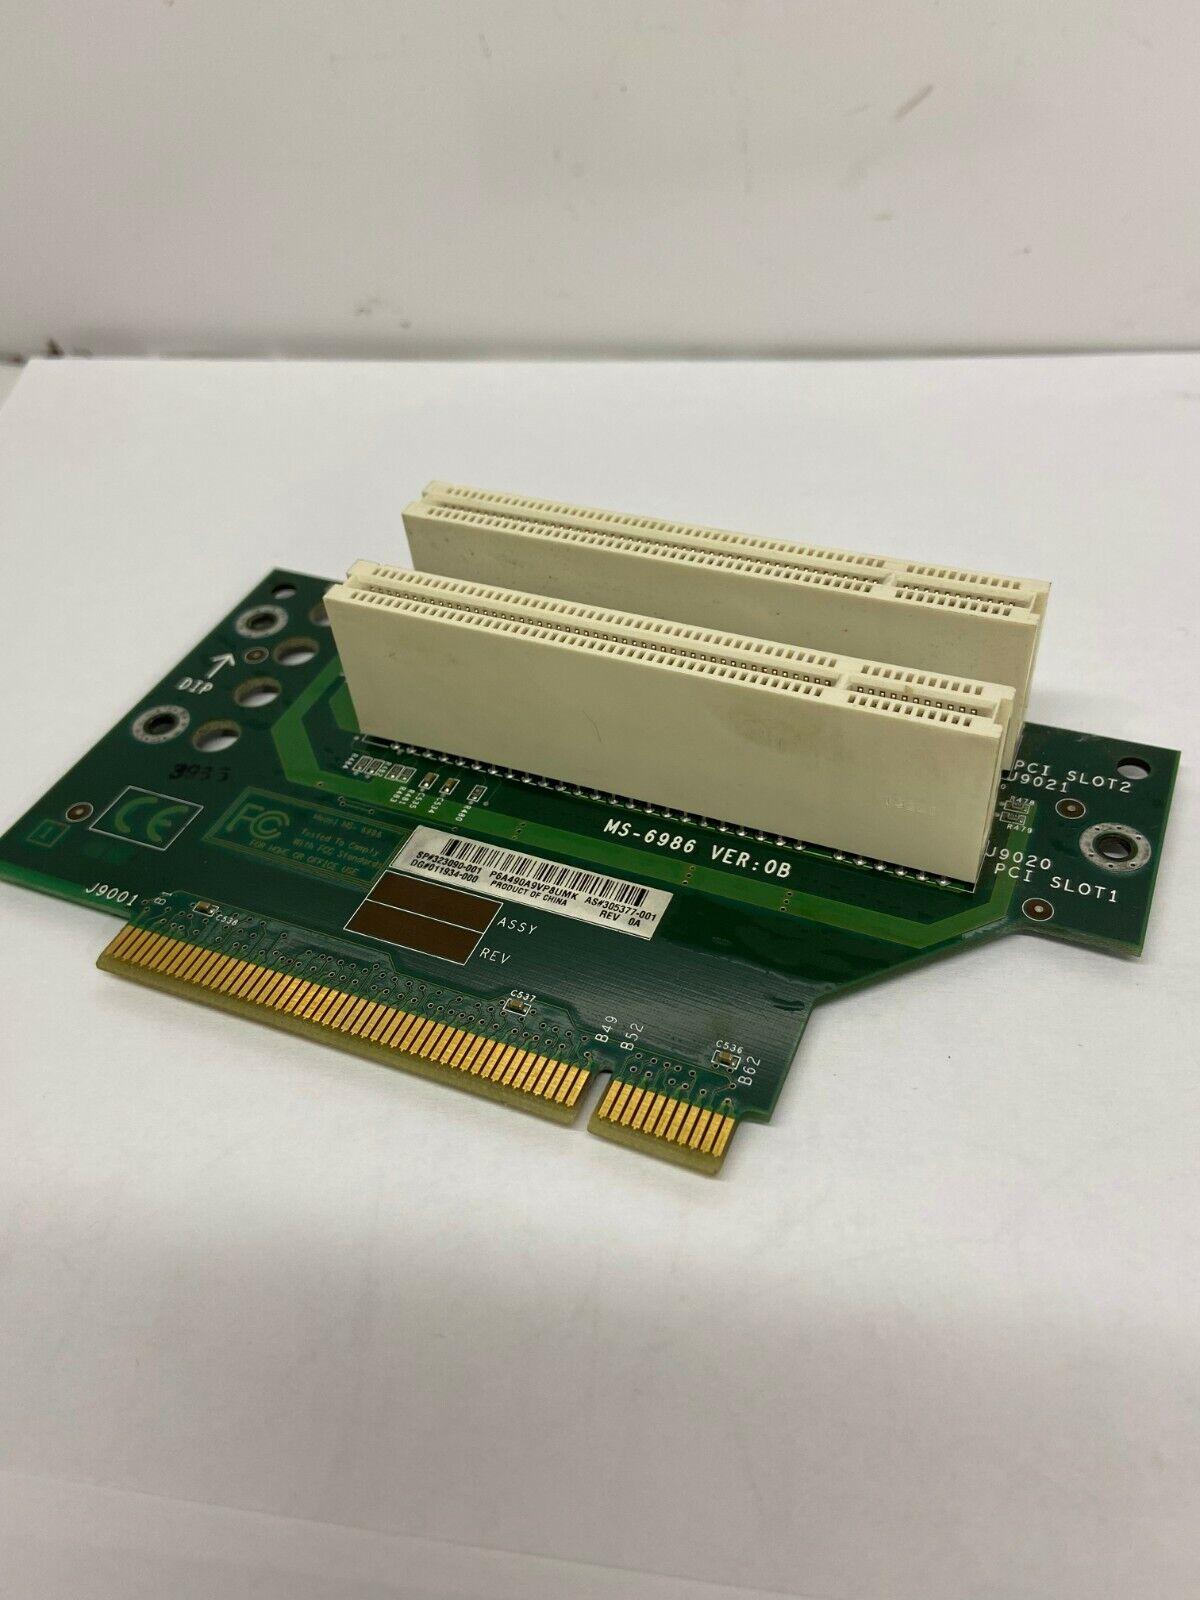 HP SFF MS-6986 PCI Riser Card Angle Adapter 323090-001 *Free Shipping *